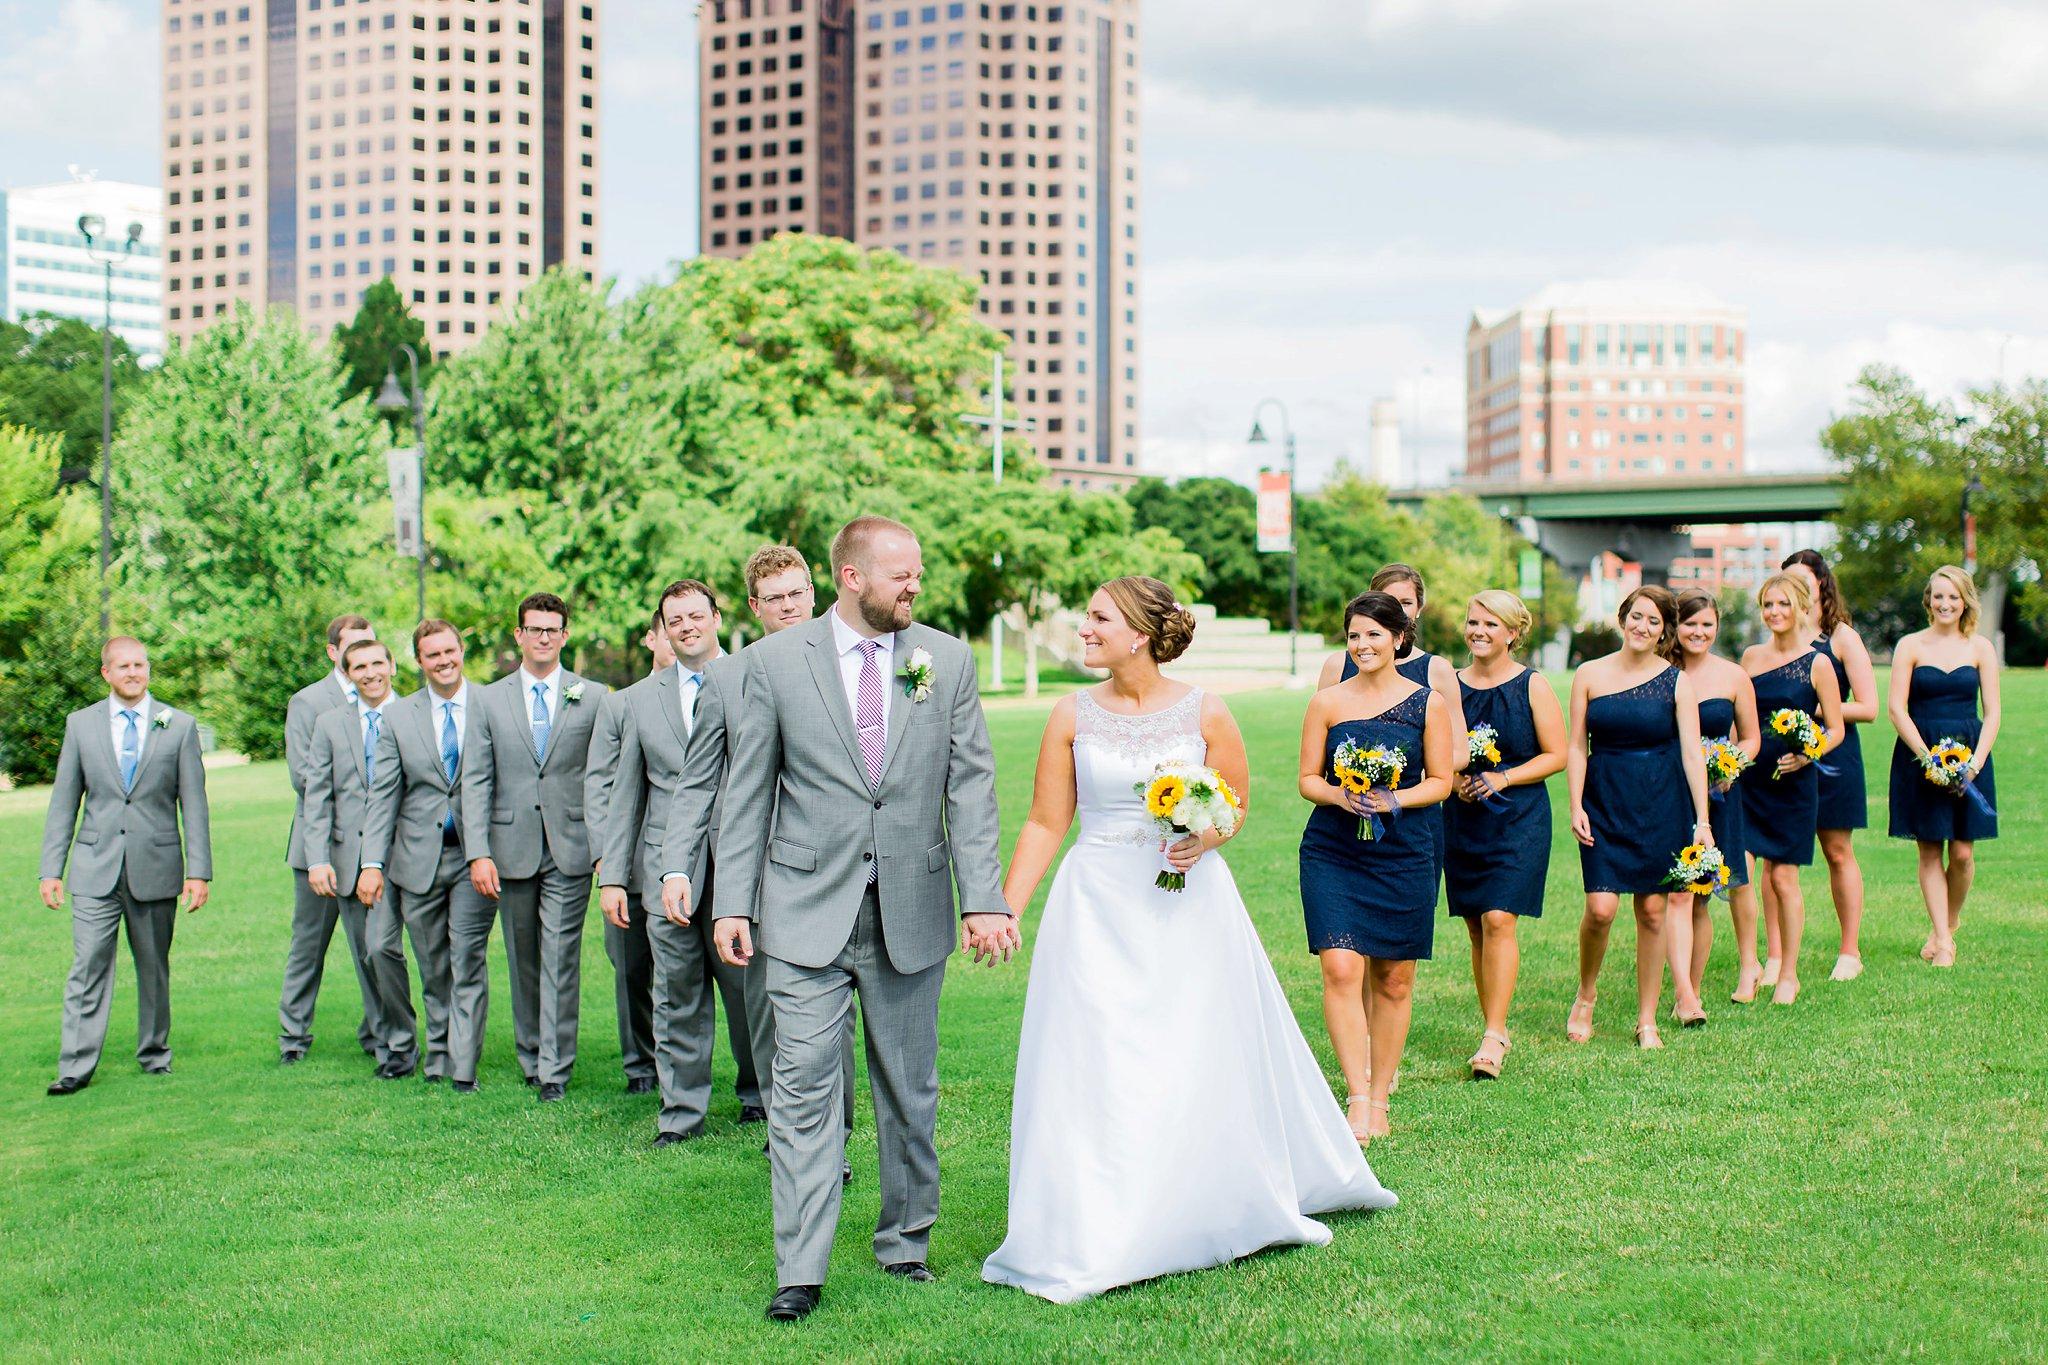 Historic Tredegar Wedding Richmond Wedding Photographer Maggie & Alan Megan Kelsey Photography-150.jpg